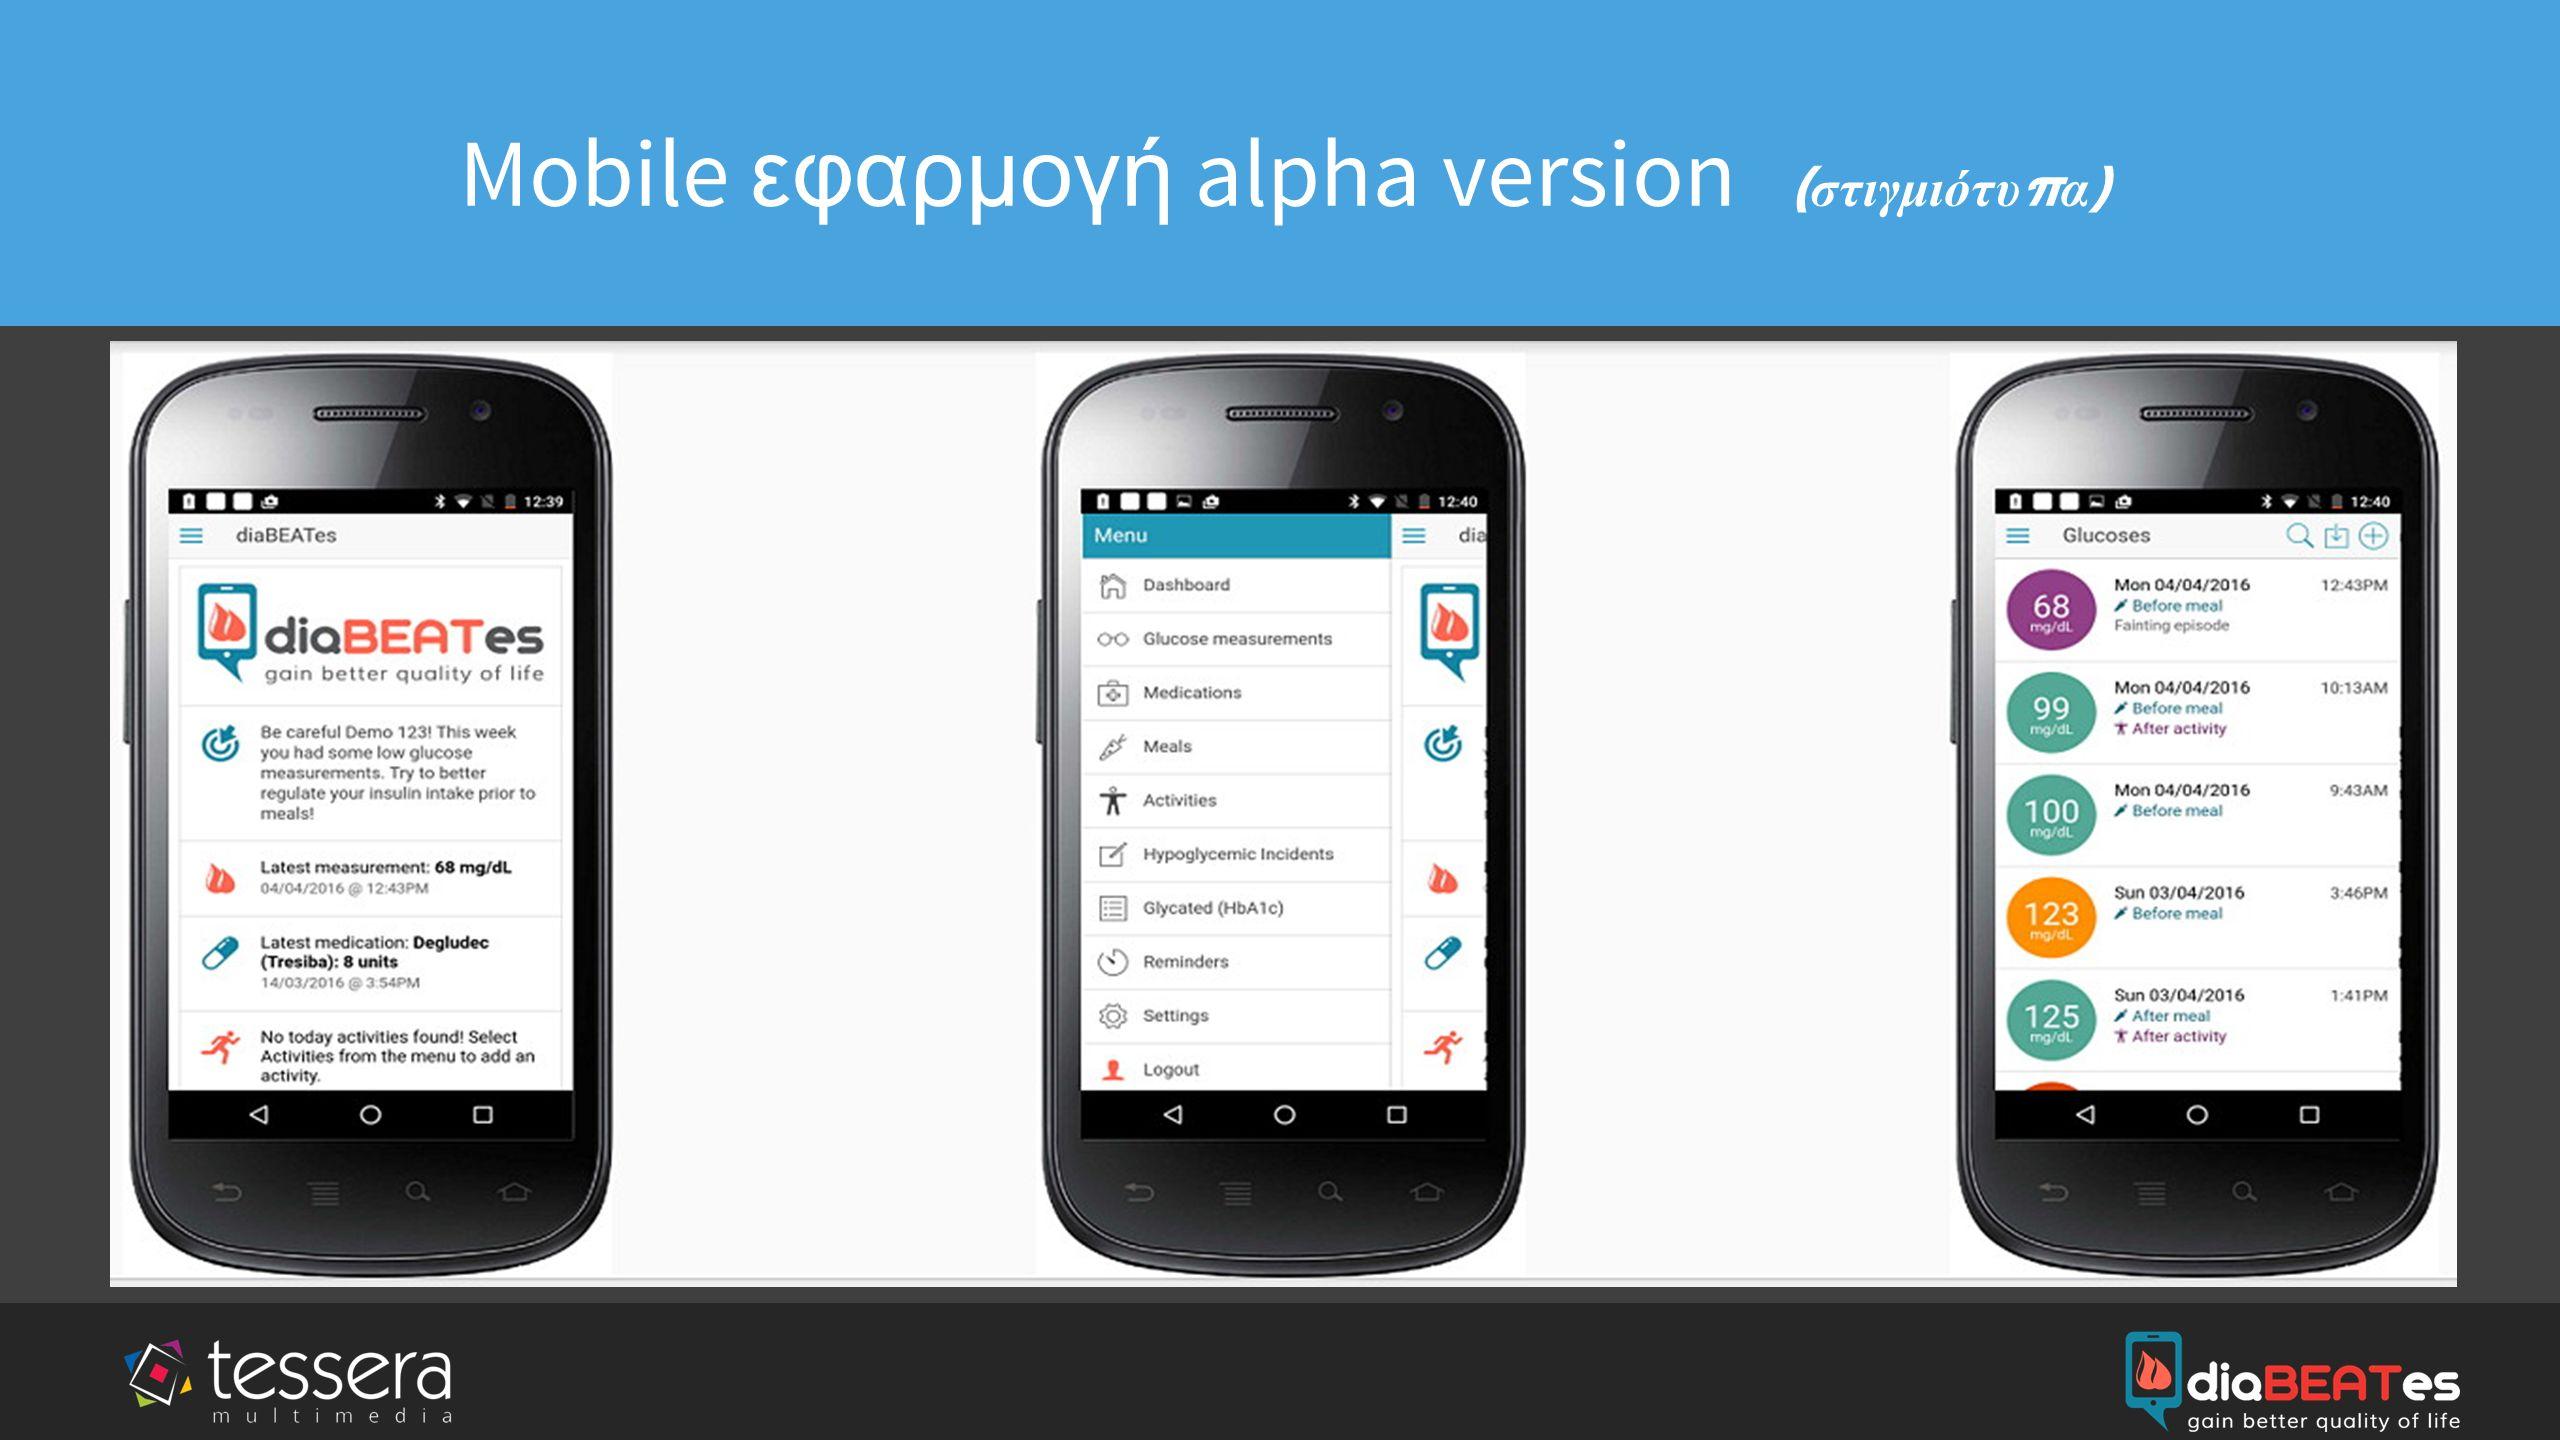 company logo & name Mobile εφαρμογή alpha version ( στιγμιότυ π α )